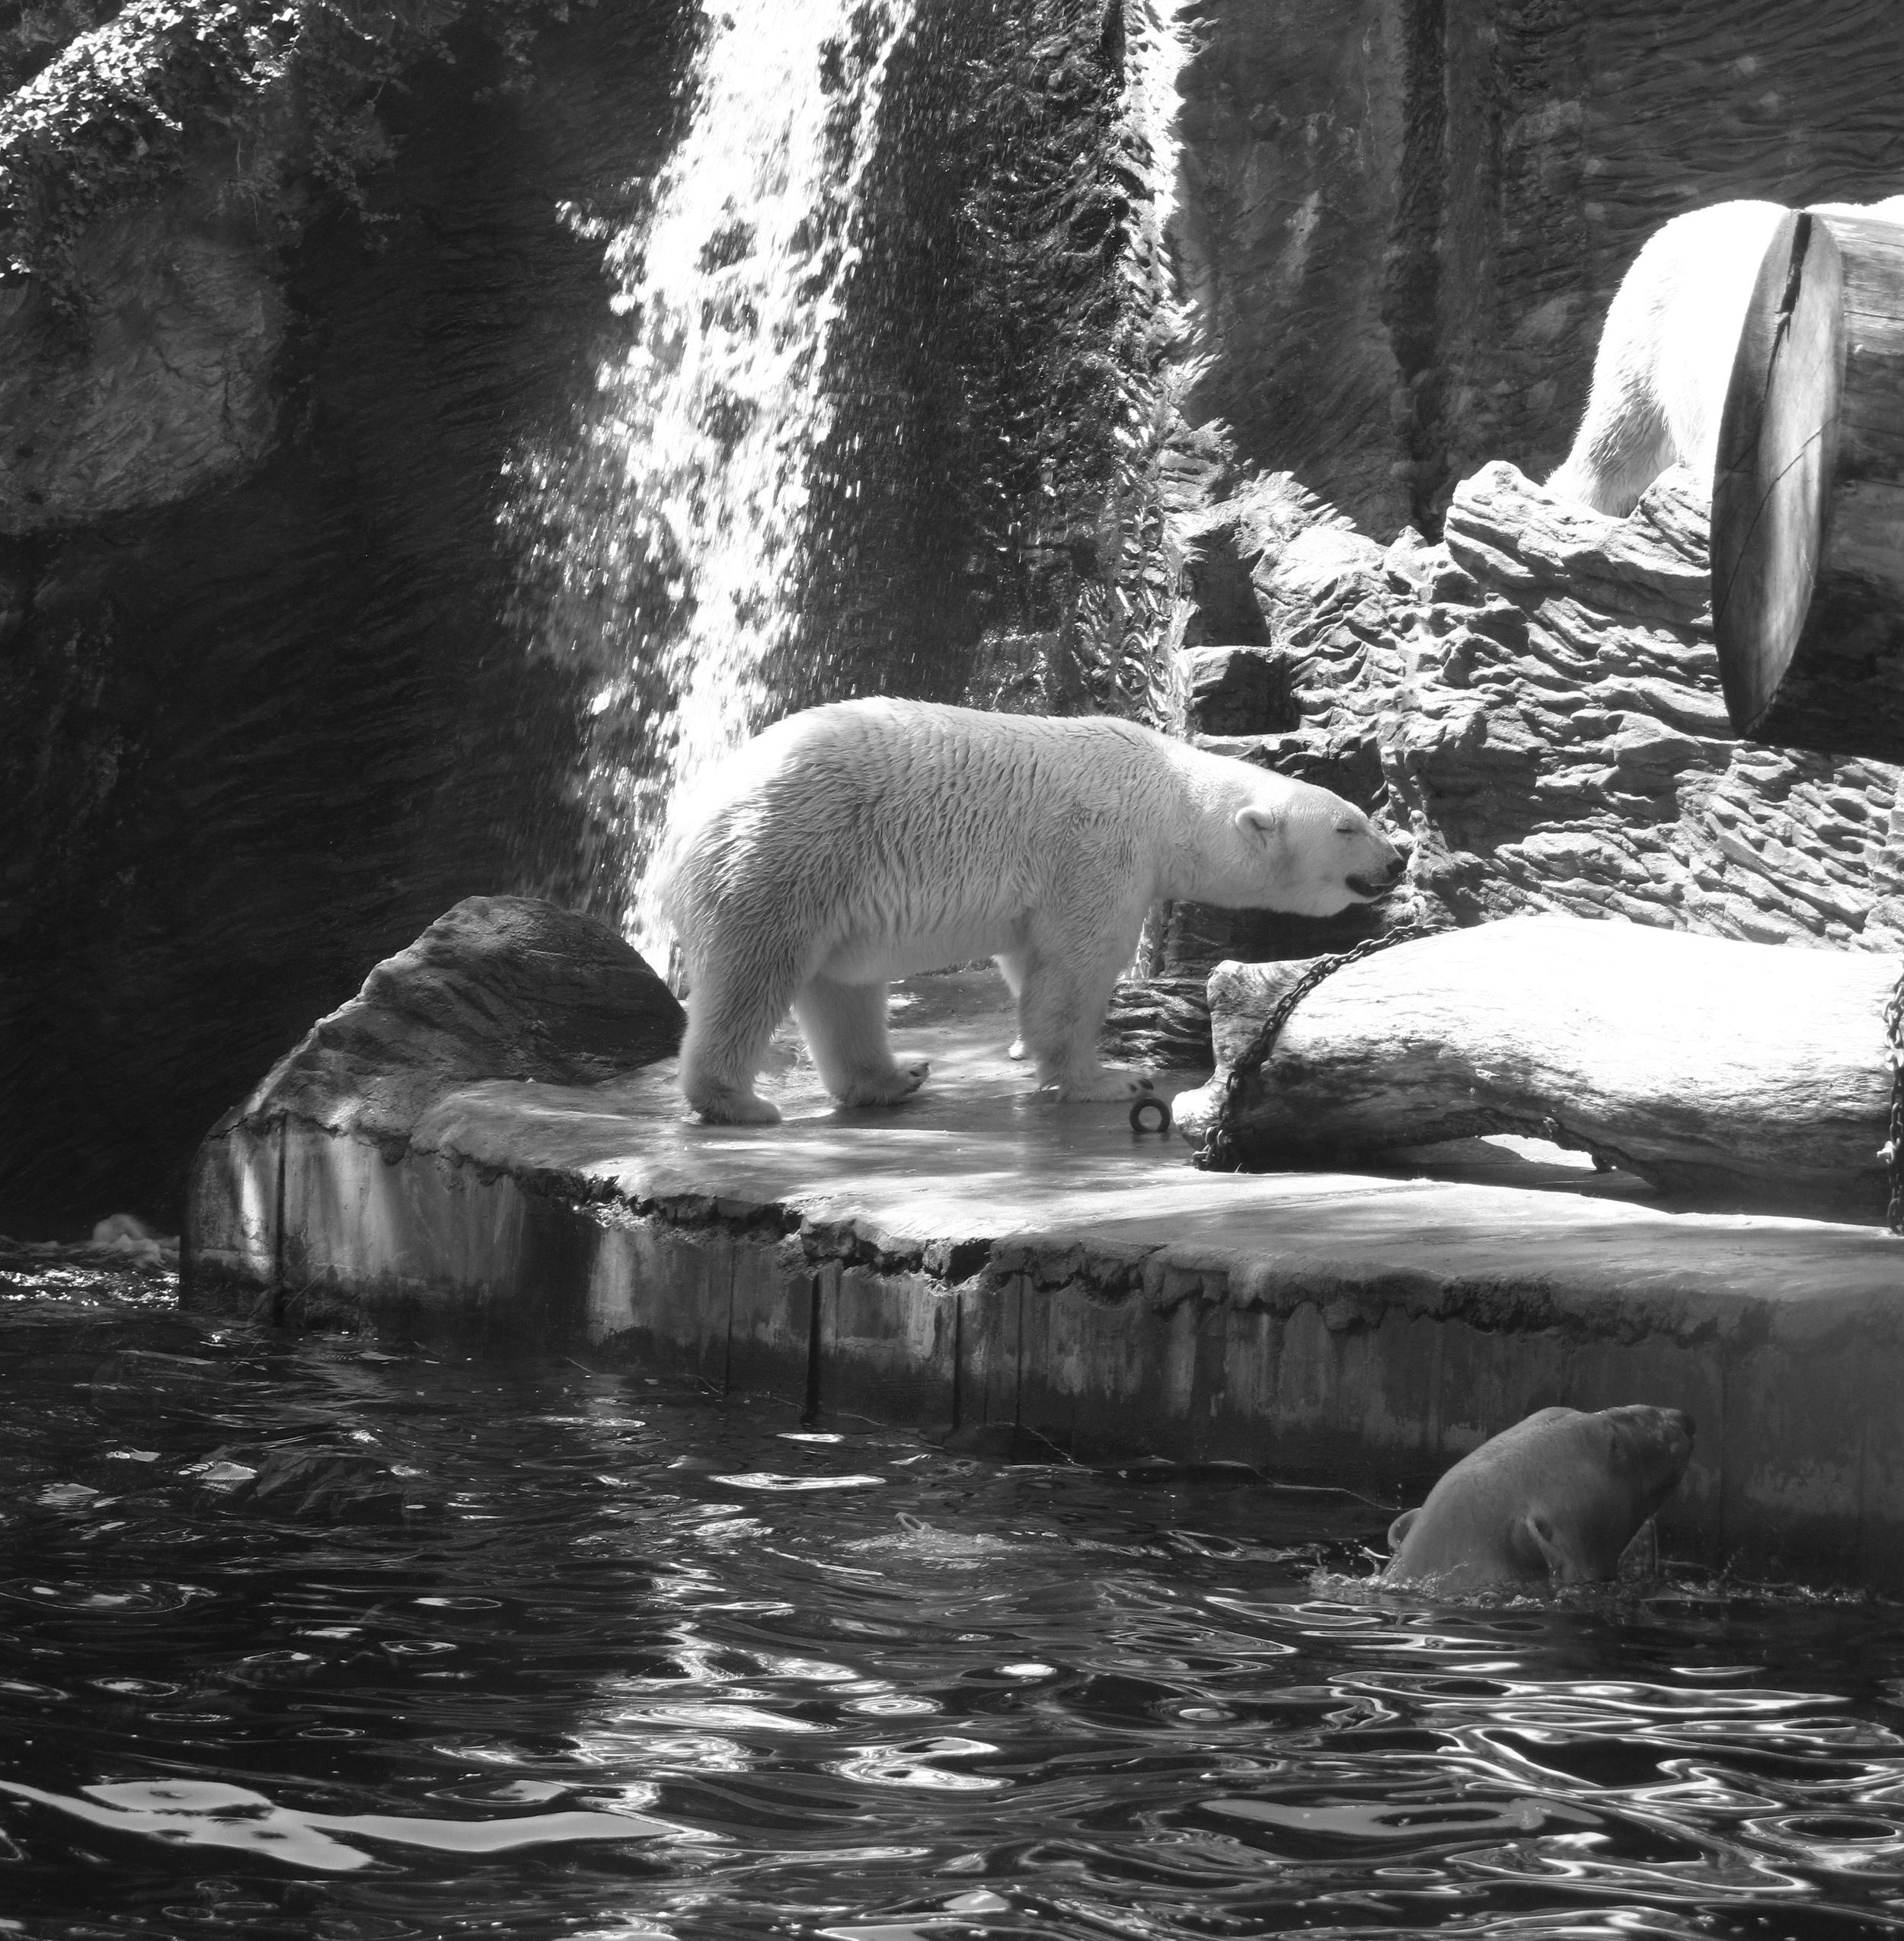 Polar bears swimming